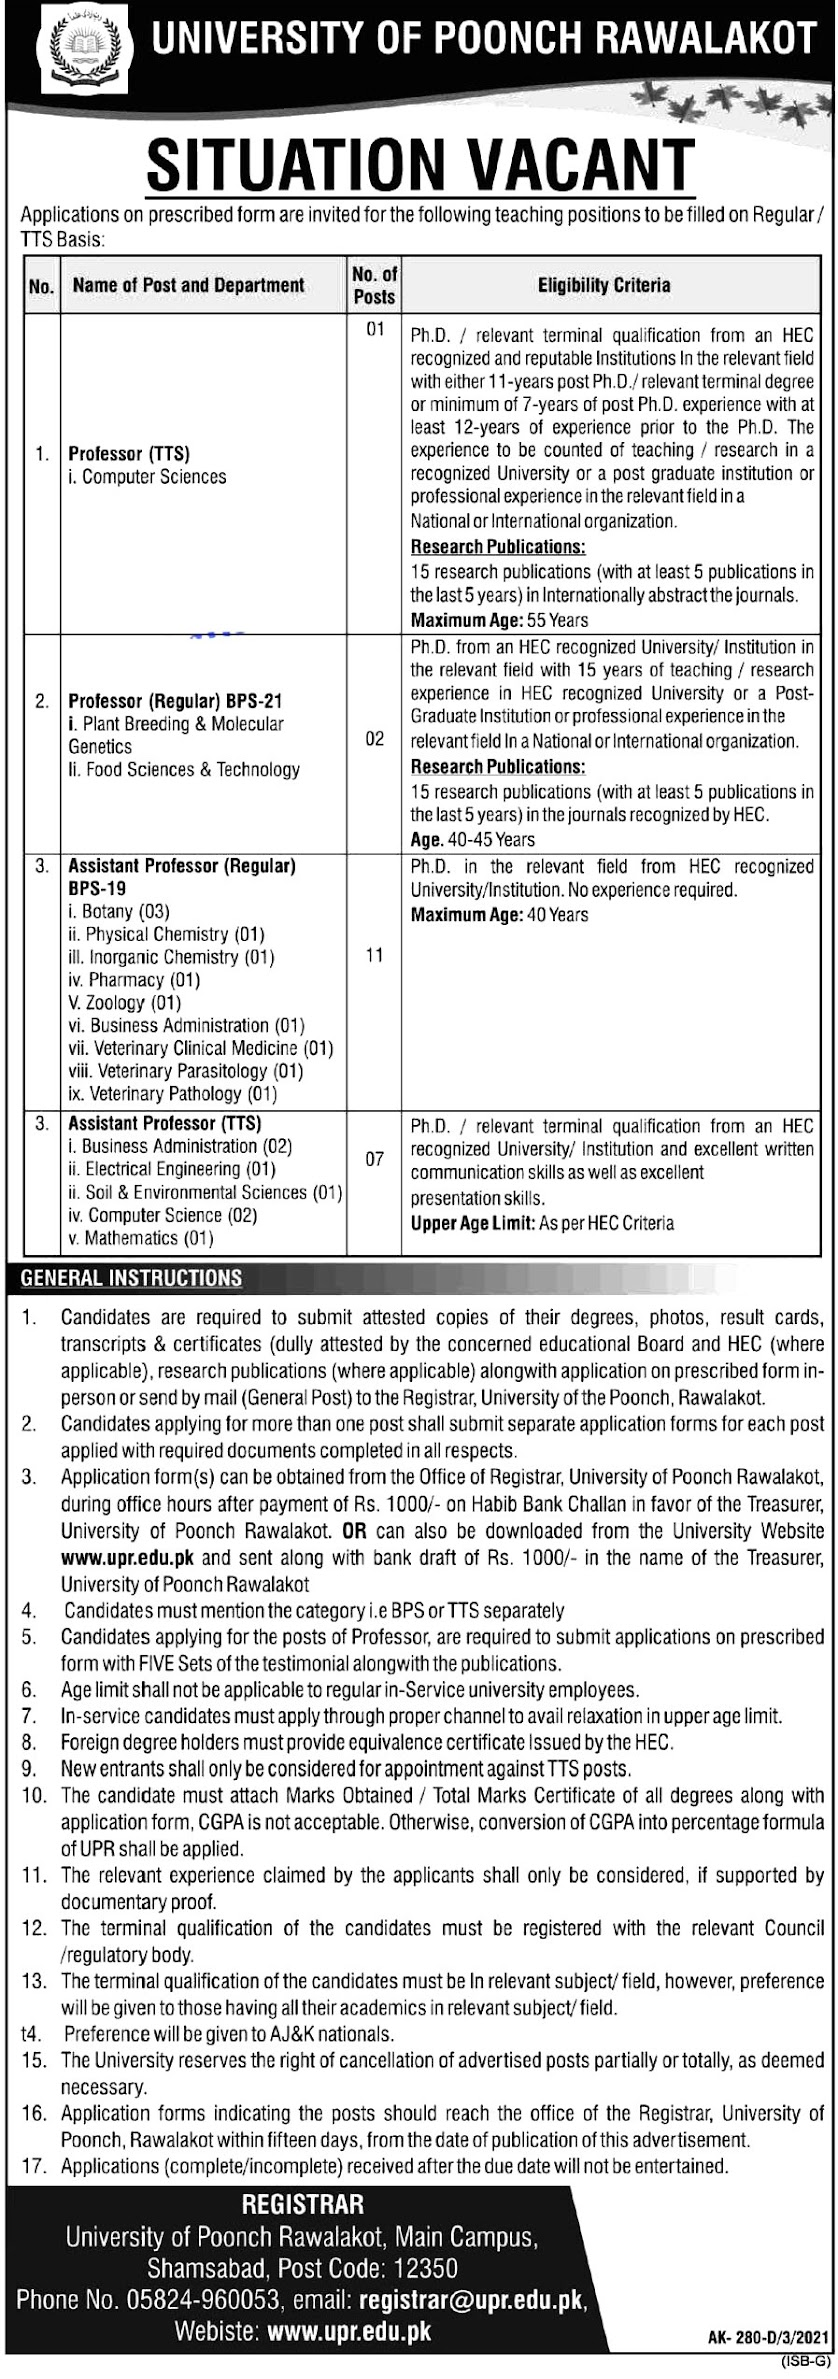 Latest Jobs in University of  Poonch Rawalakot 2021